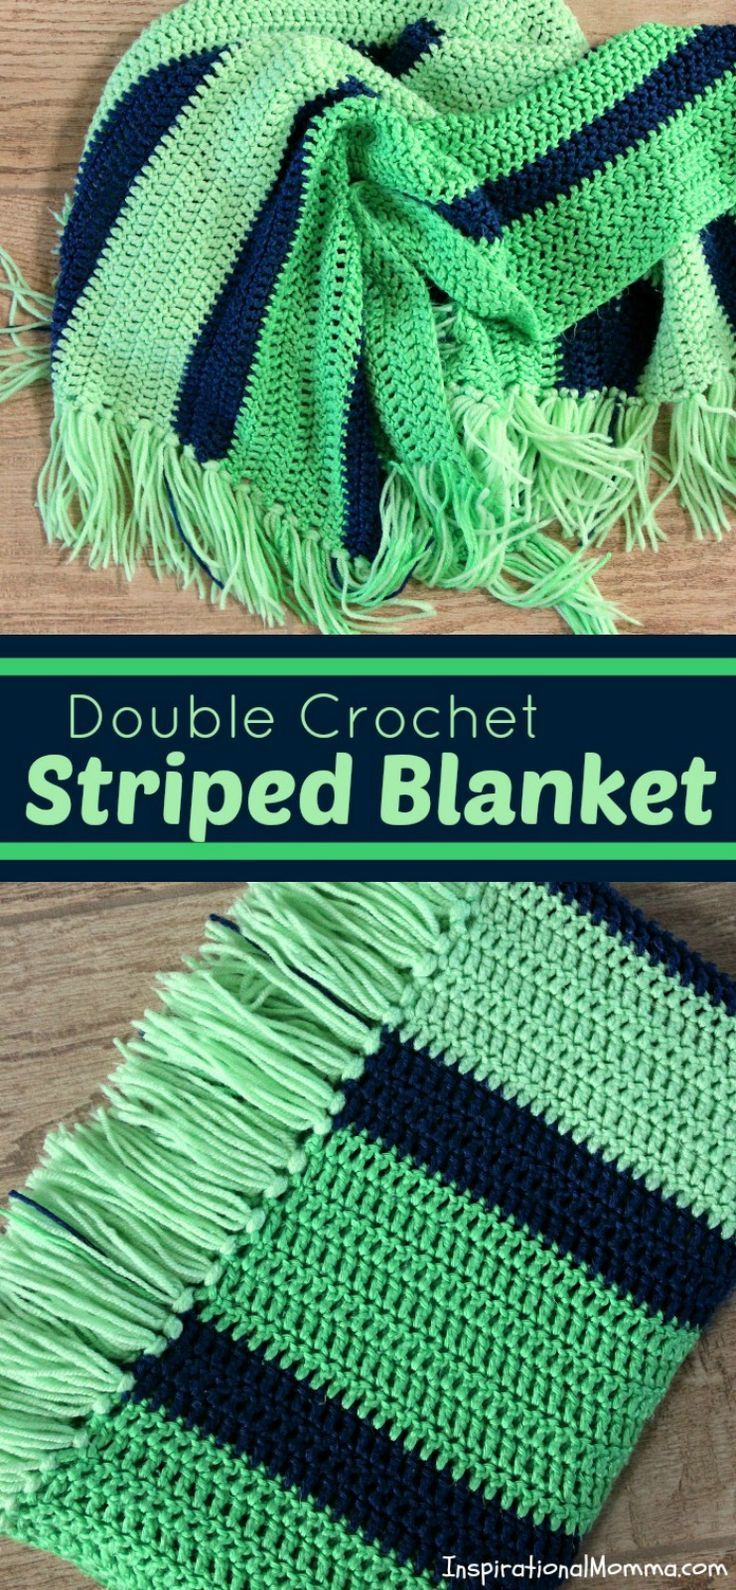 Double Crochet Striped Blanket By Tanille - Free Crochet Pattern - (inspirationalmomma)